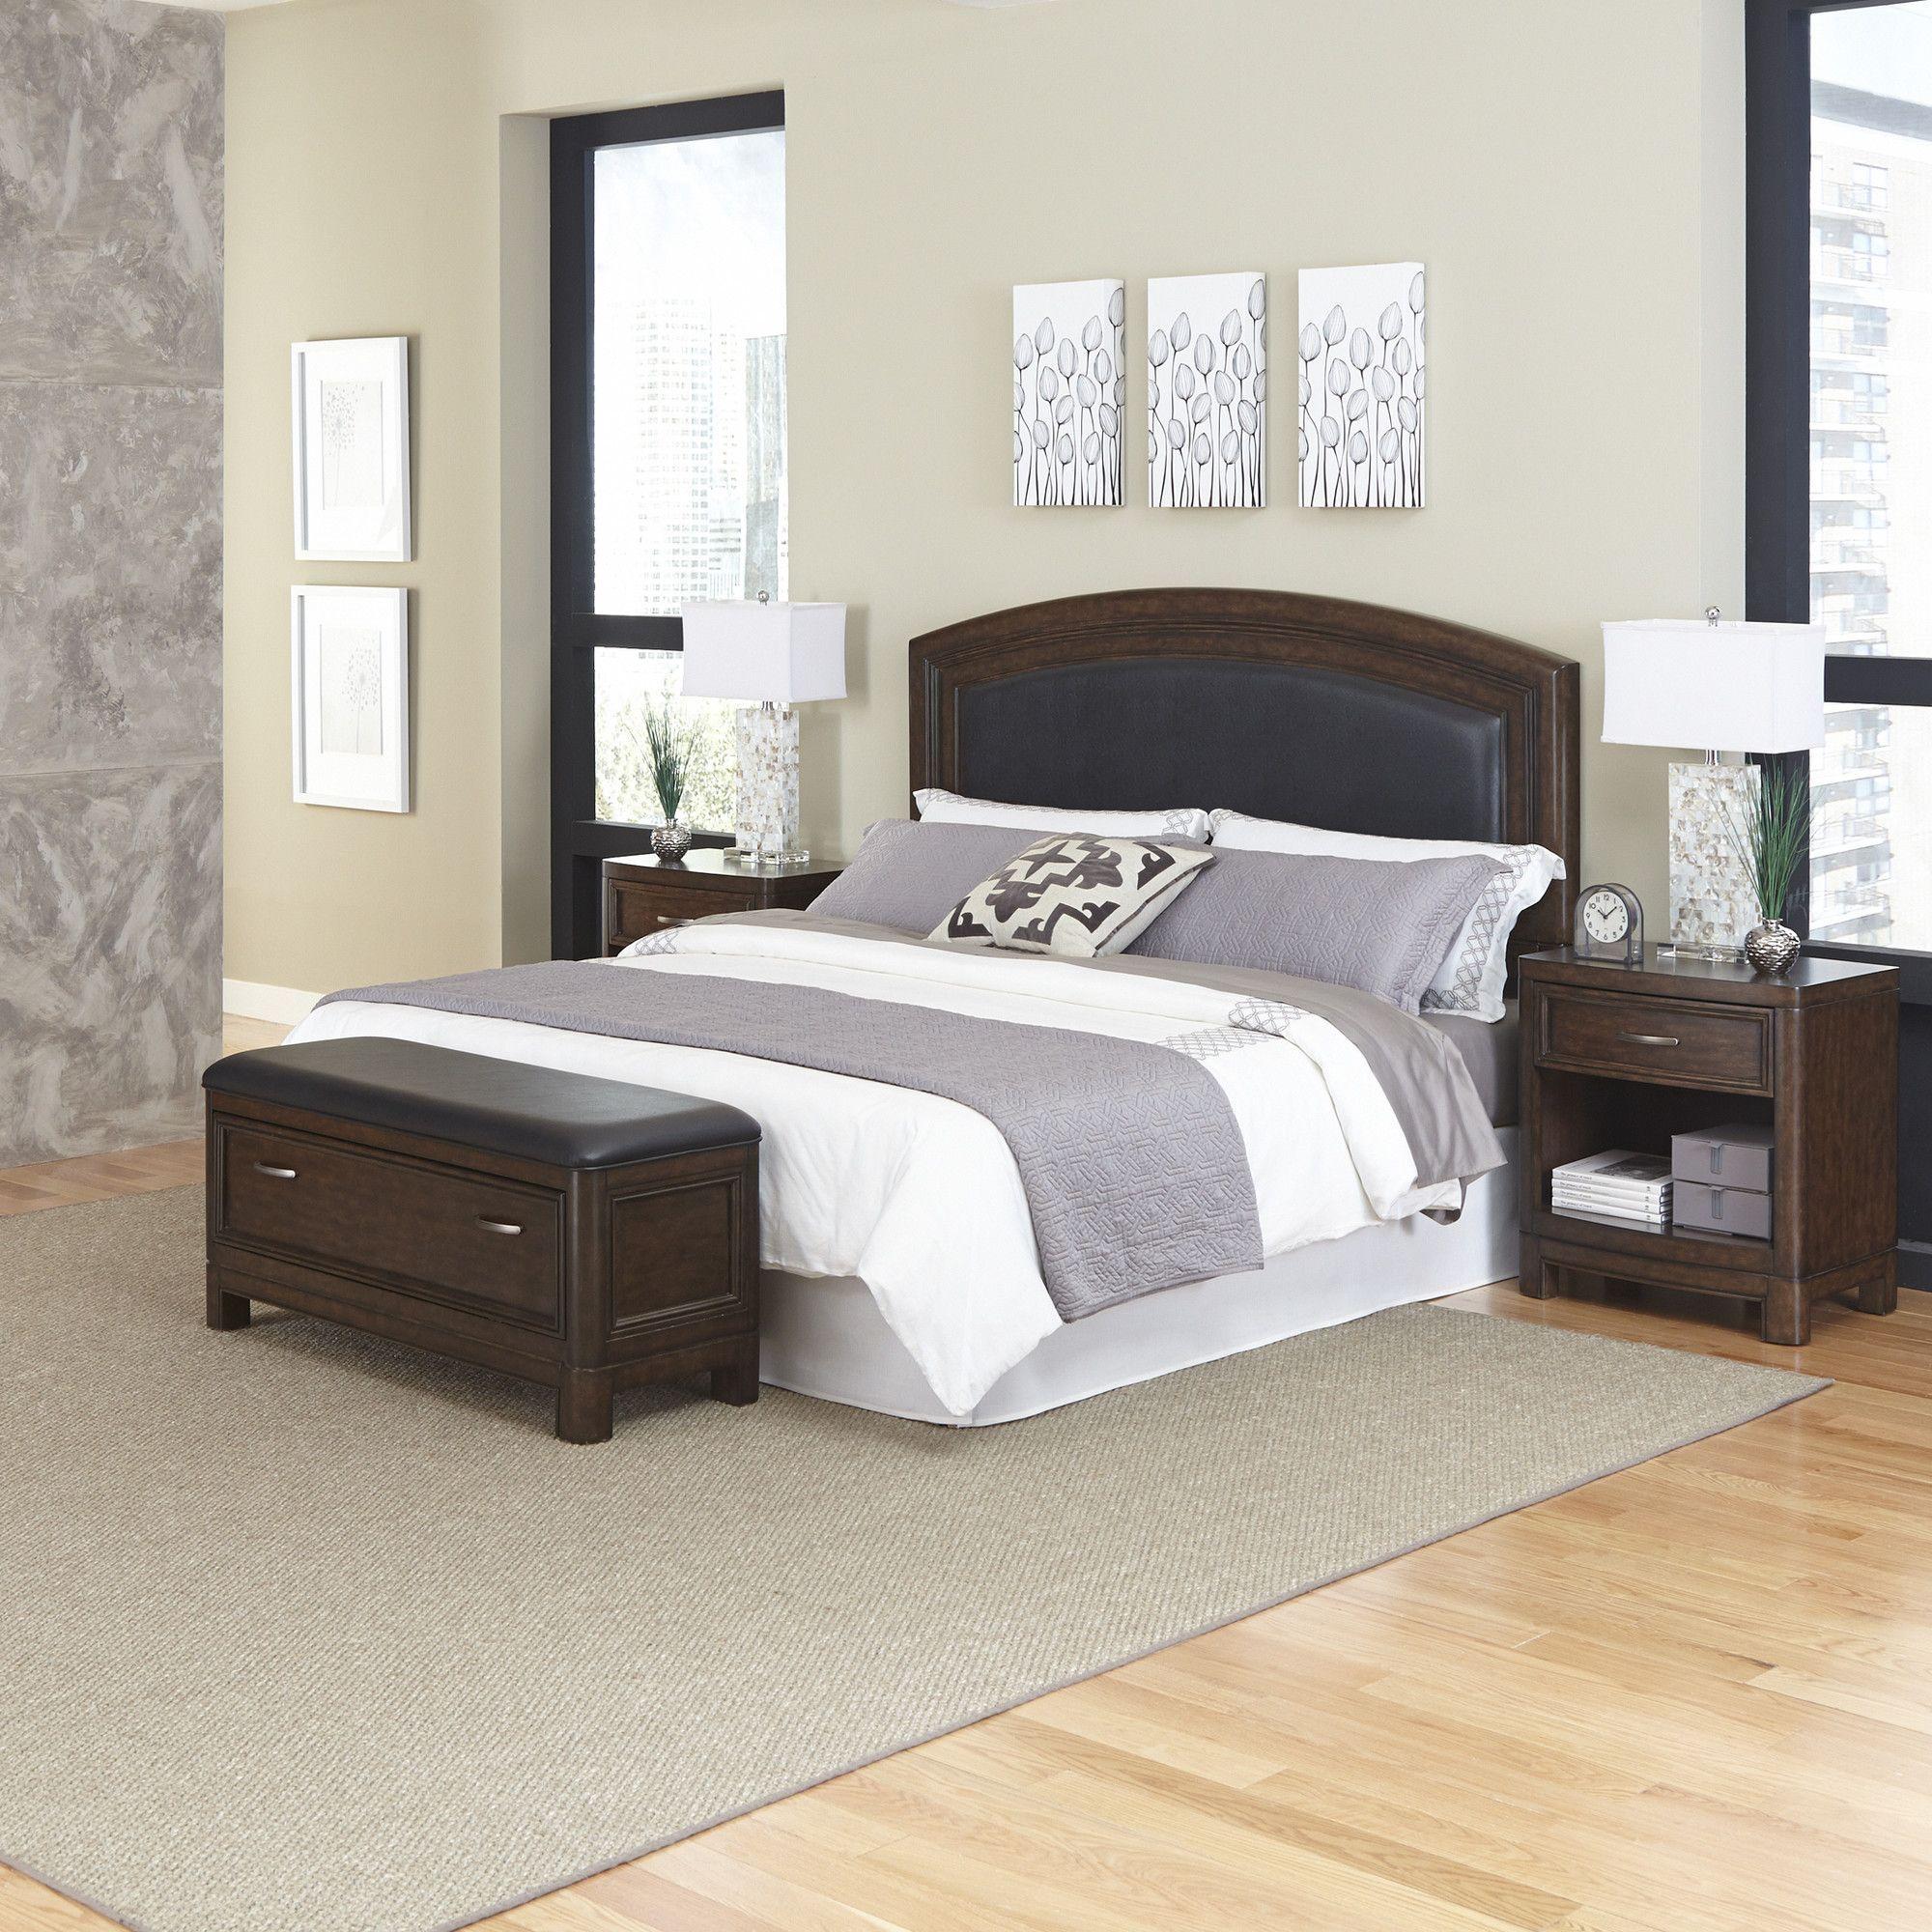 Crescent hill panel piece bedroom set products pinterest